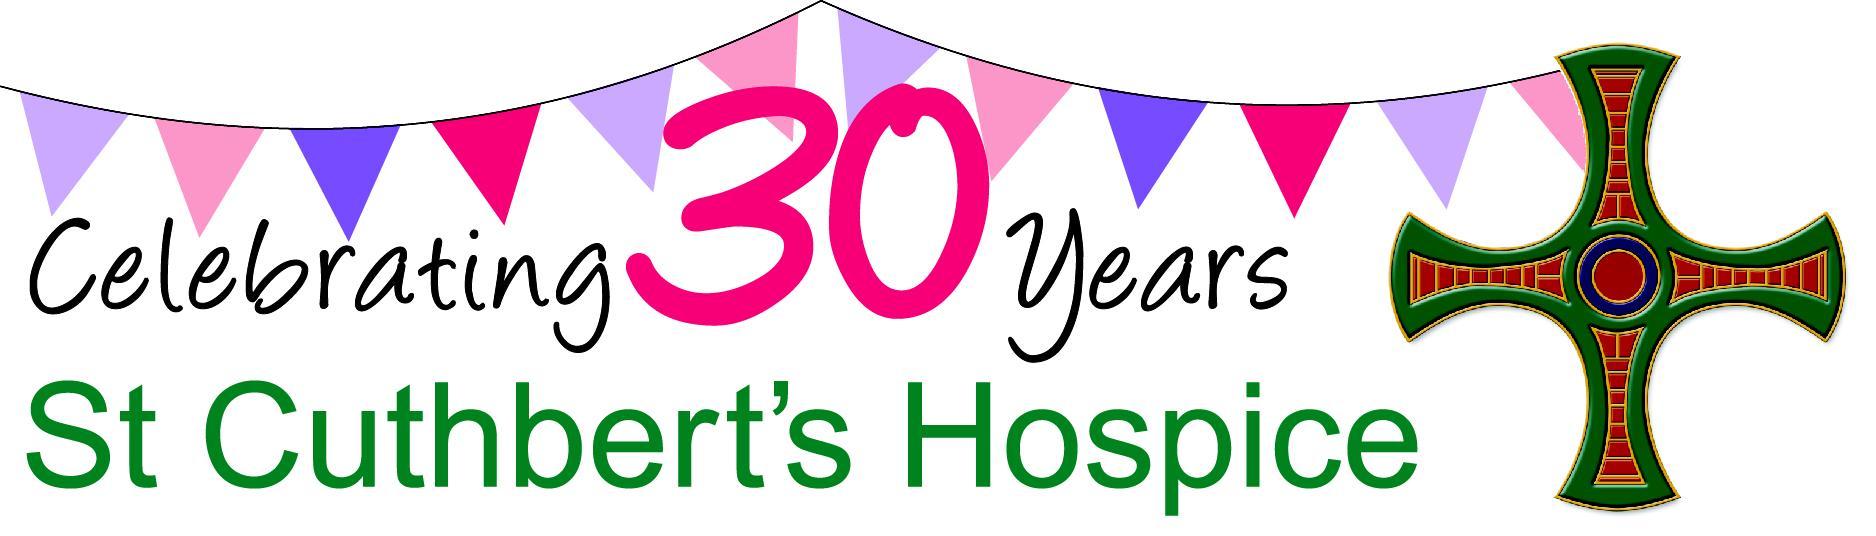 St Cuthbert's 30th anniversary